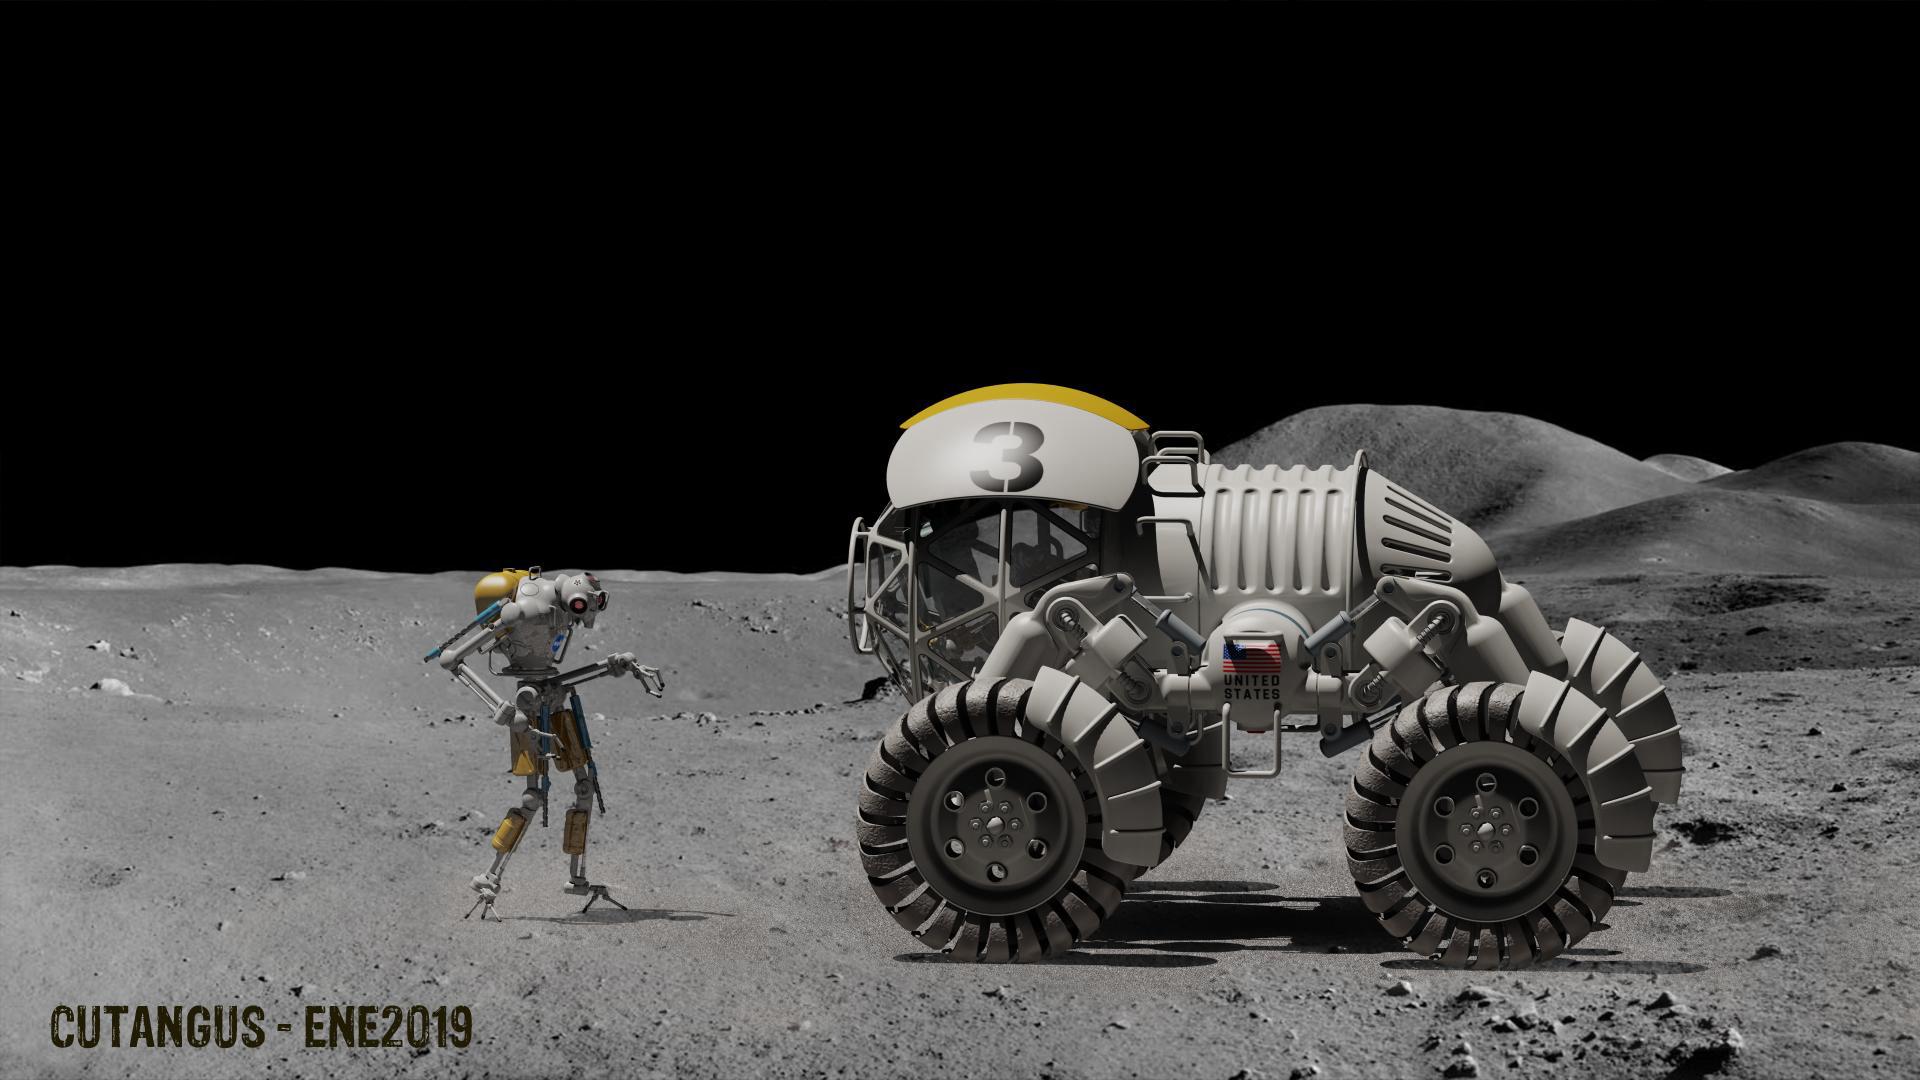 Manoeuvering in the Moon by CUTANGUS